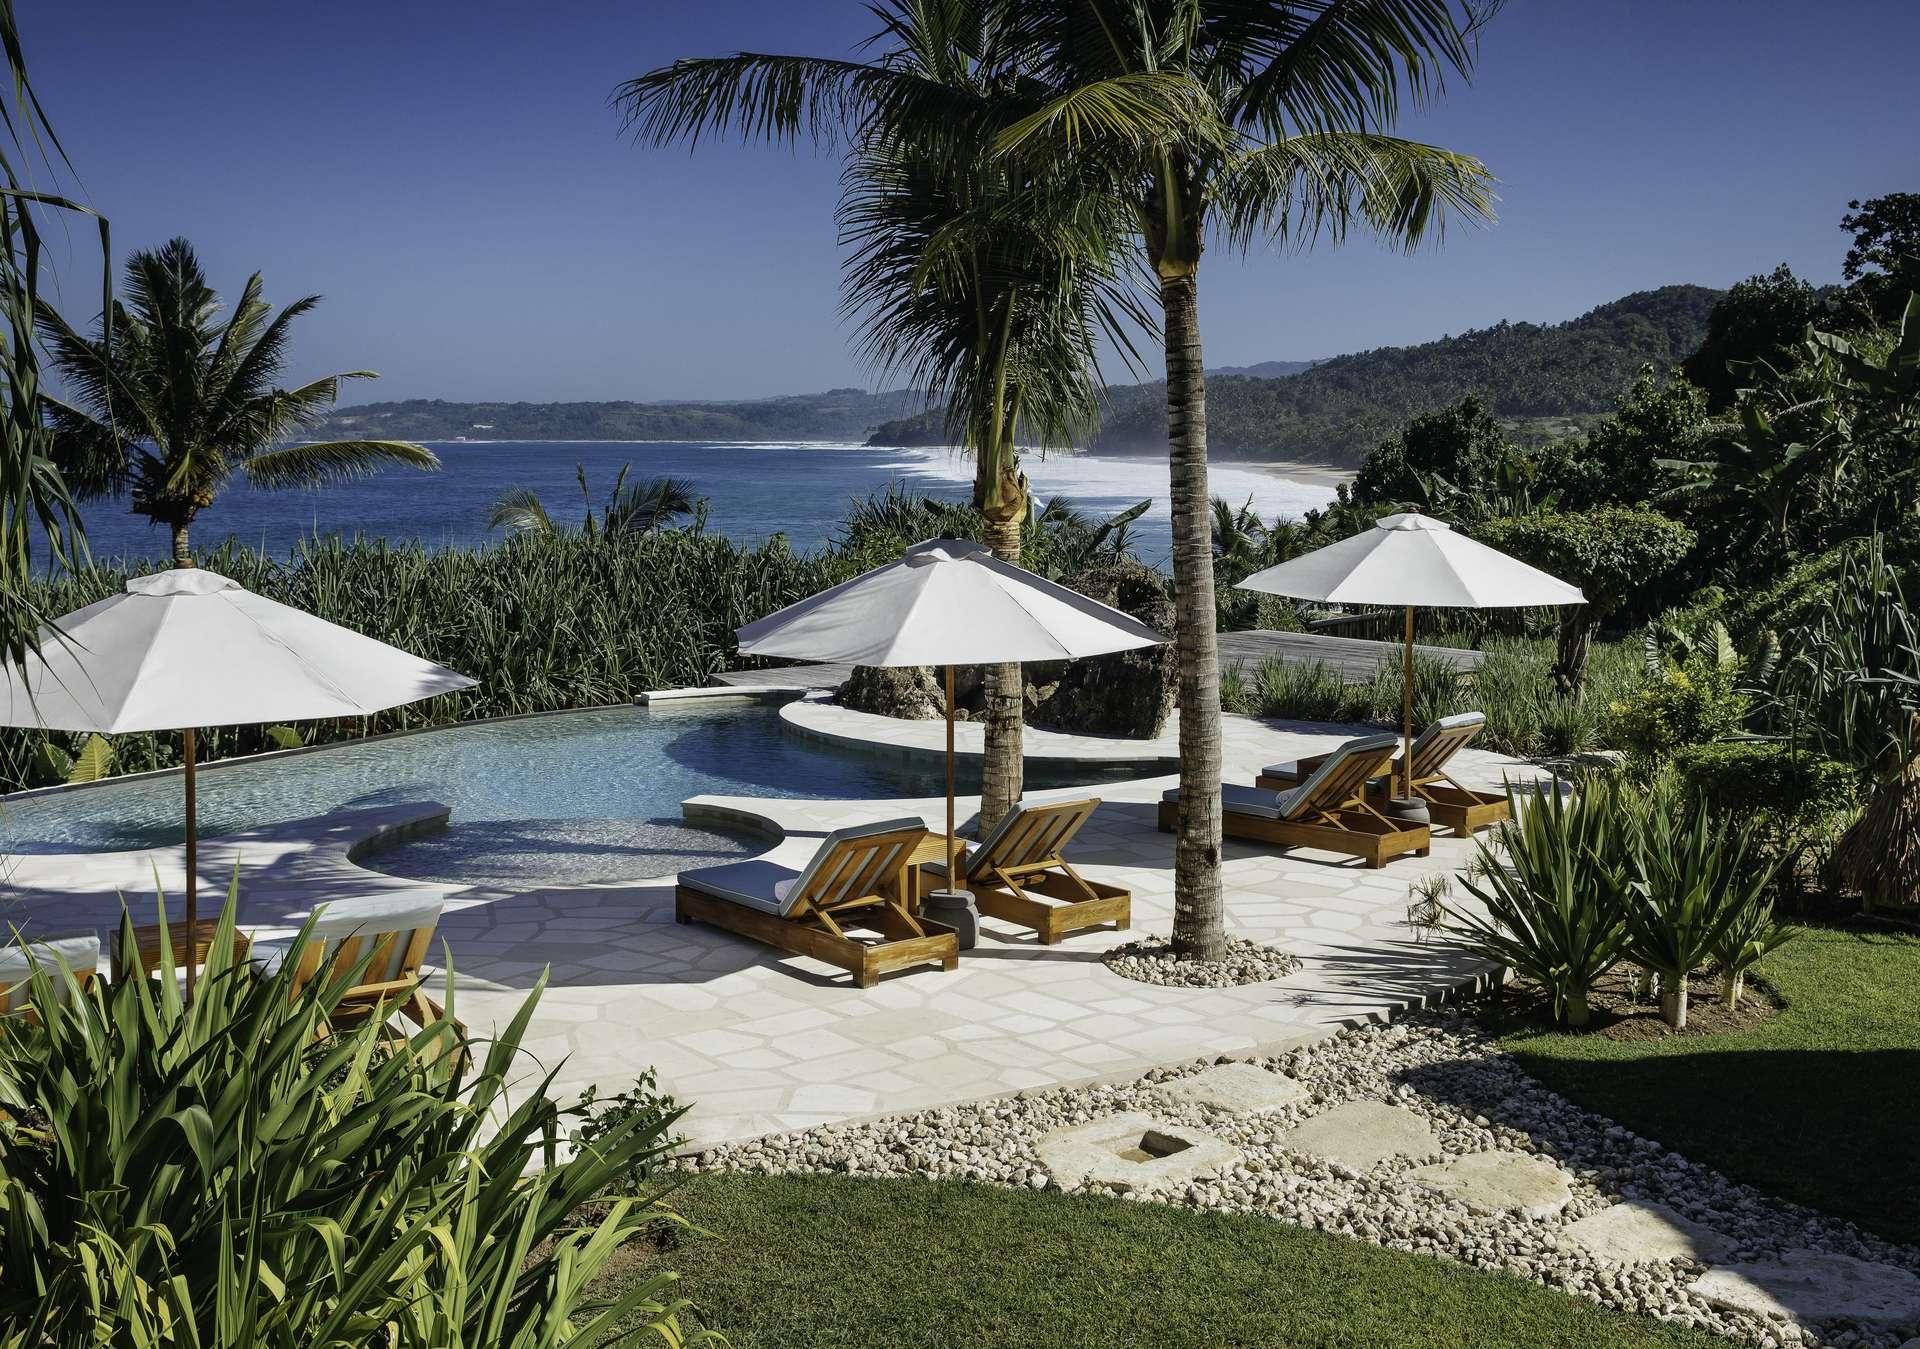 Luxury villa rentals asia - Indonesia - Sumba - Nihi sumba - Wamoro Estate - Image 1/19